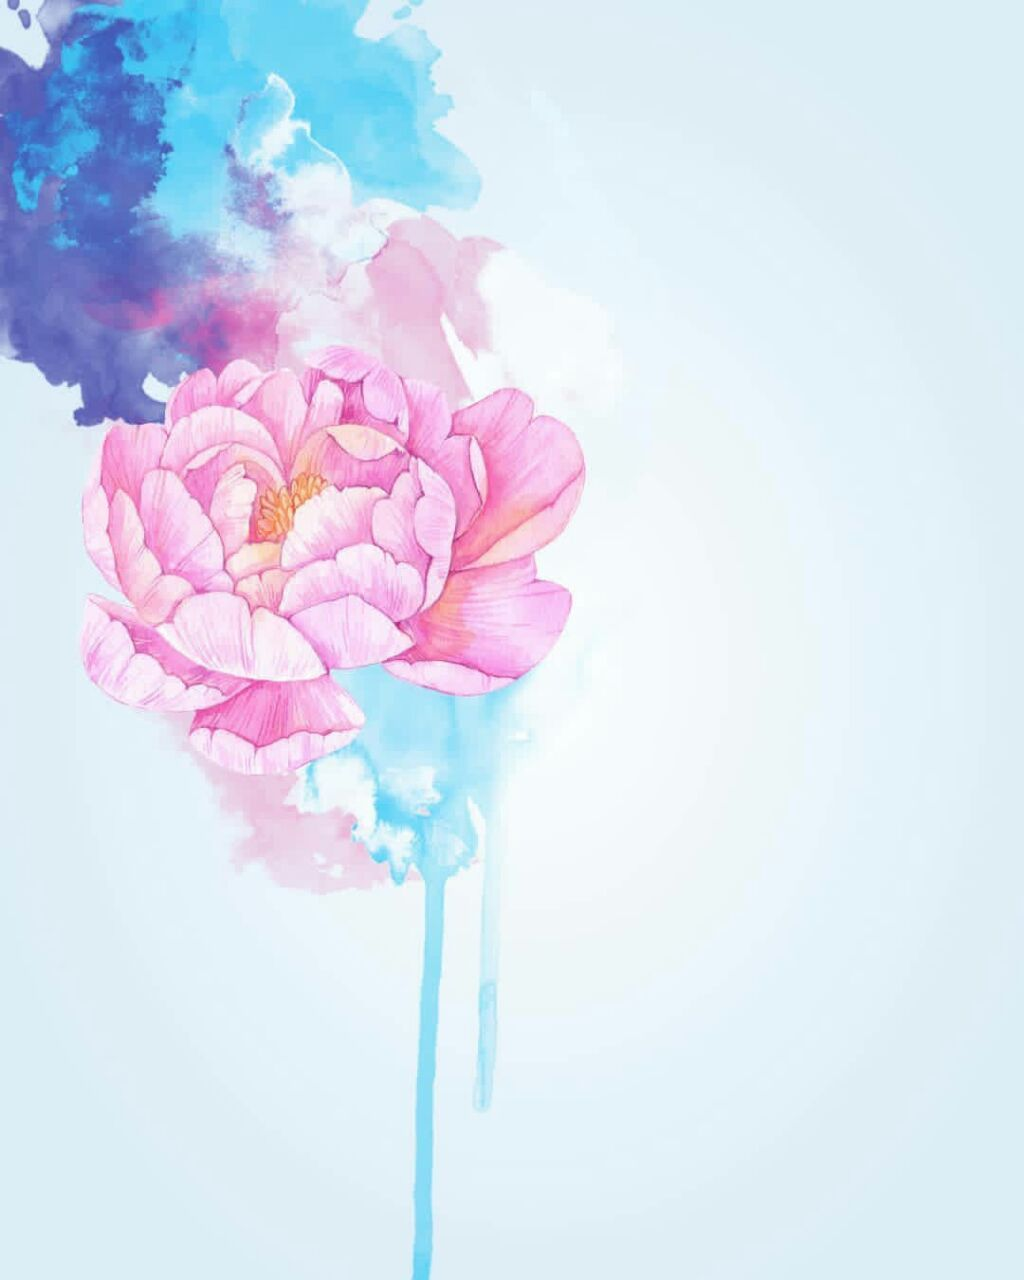 صور و خلفيات جميلة للكتابة عليها 2019 Tarek4tech Print Design Art Flower Backgrounds Flower Background Wallpaper